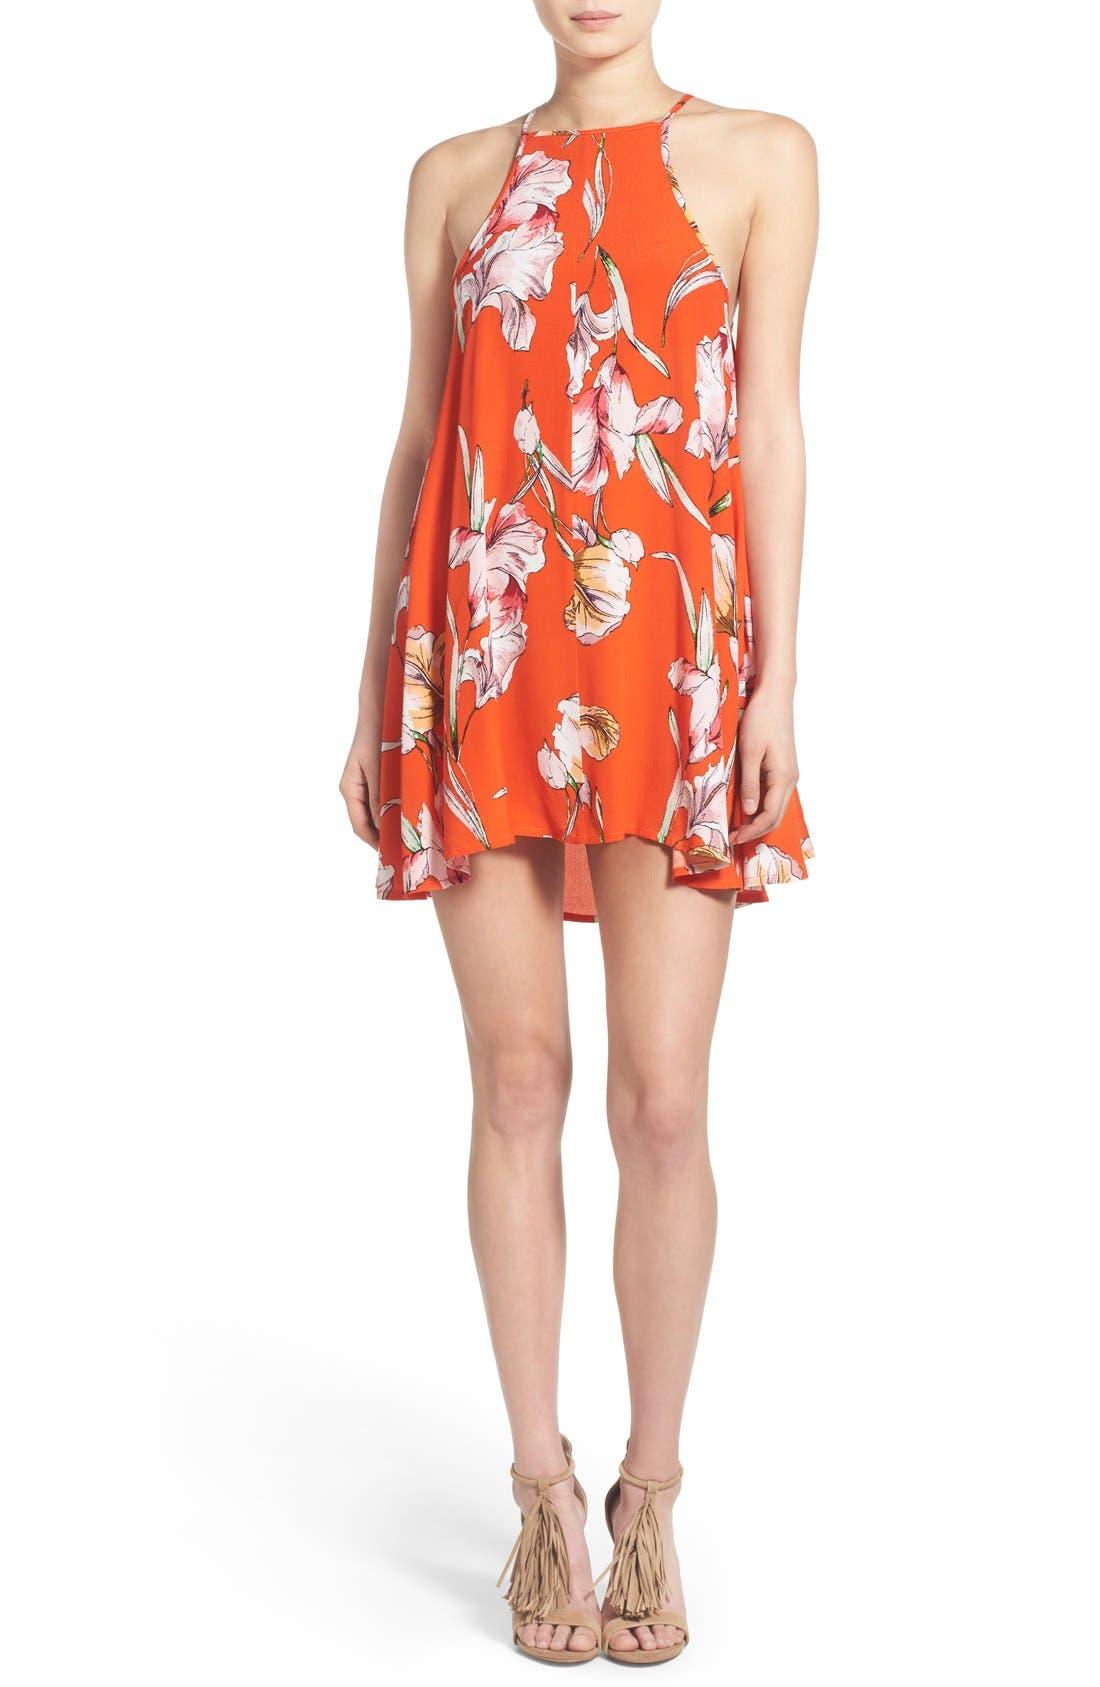 Alternate Image 1 Selected - MINKPINK 'Tangerine Dream' Floral Print Swing Dress